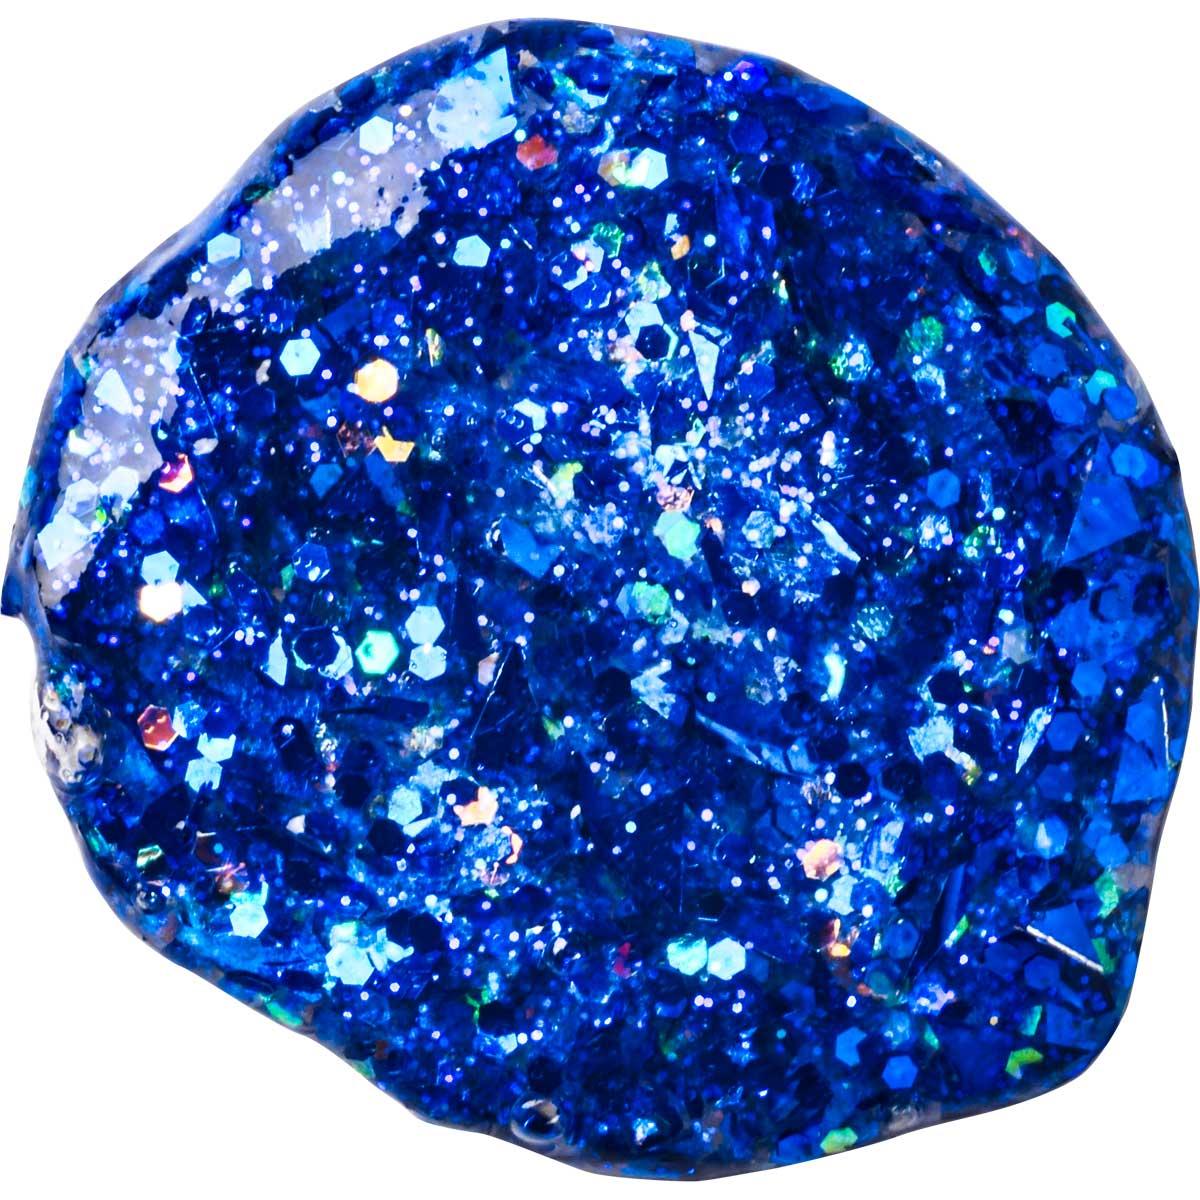 FolkArt ® Glitterific™ Acrylic Paint - Dark Blue, 2 oz. - 5933